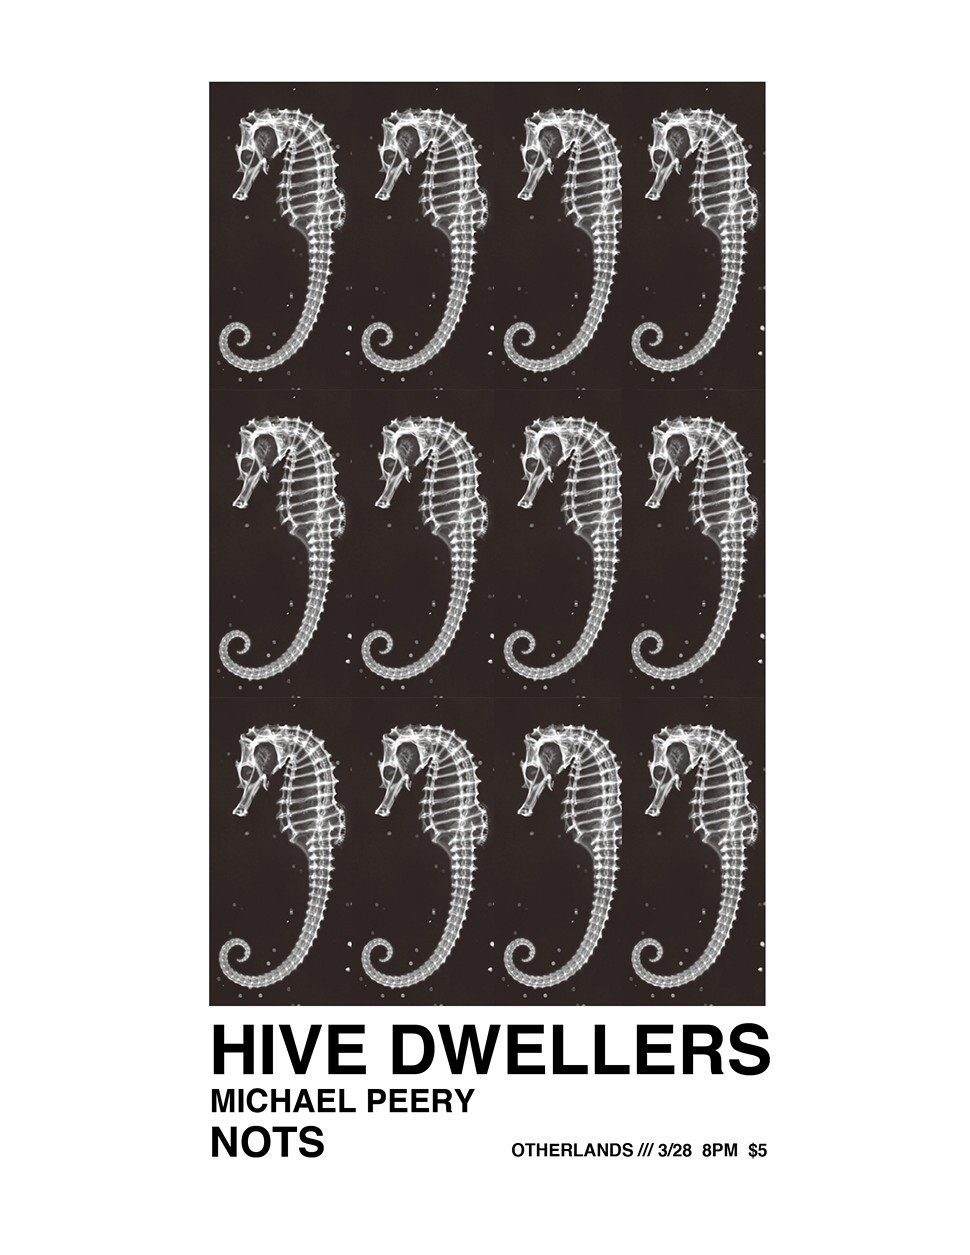 hive_dwellers.jpg